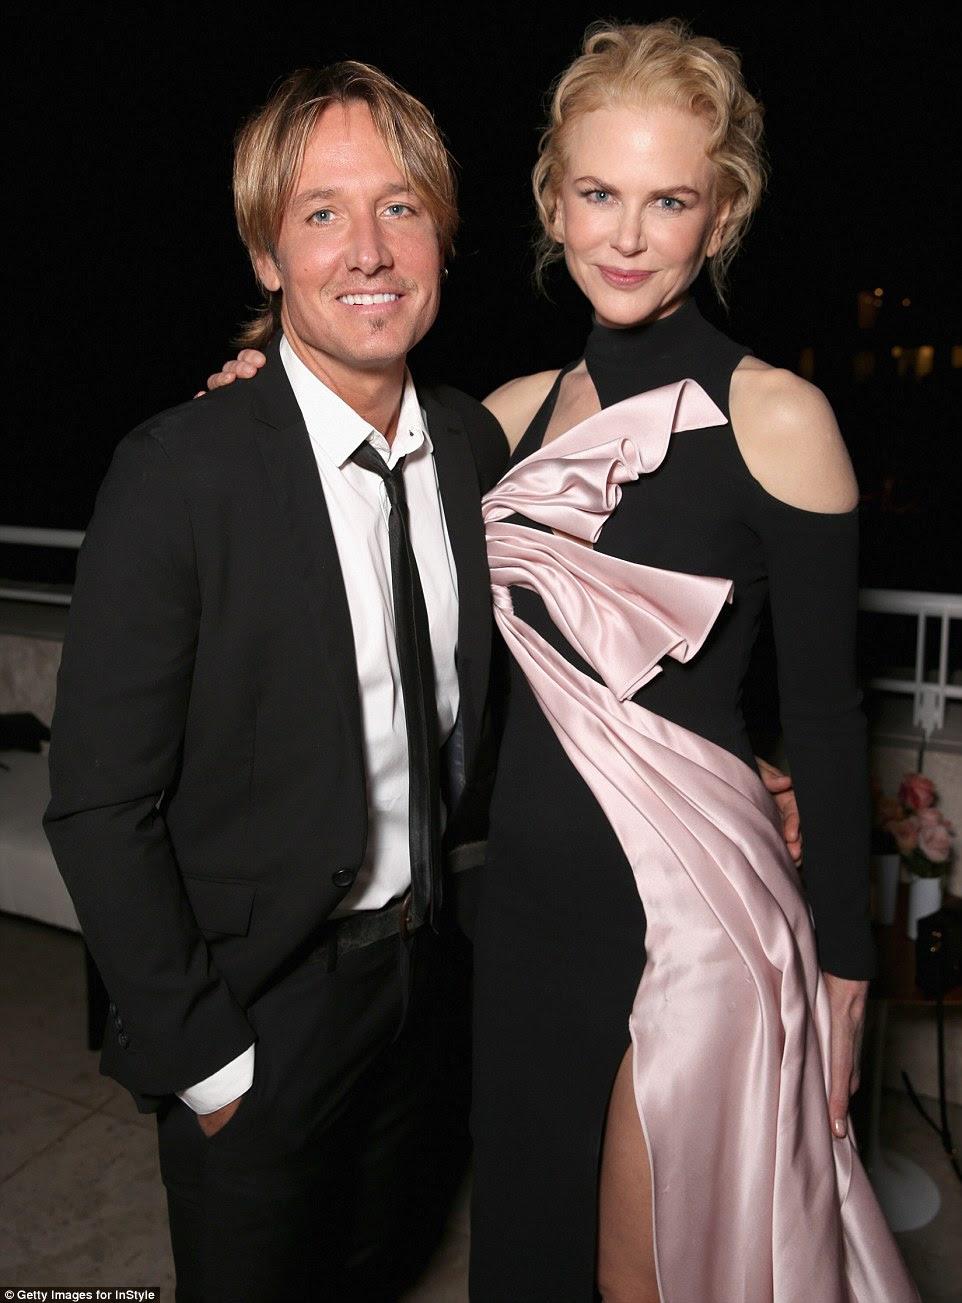 Felizes juntos: Nicole eo marido Keith Urban colocada por dentro, descartando os rumores de que eles estão nas rochas